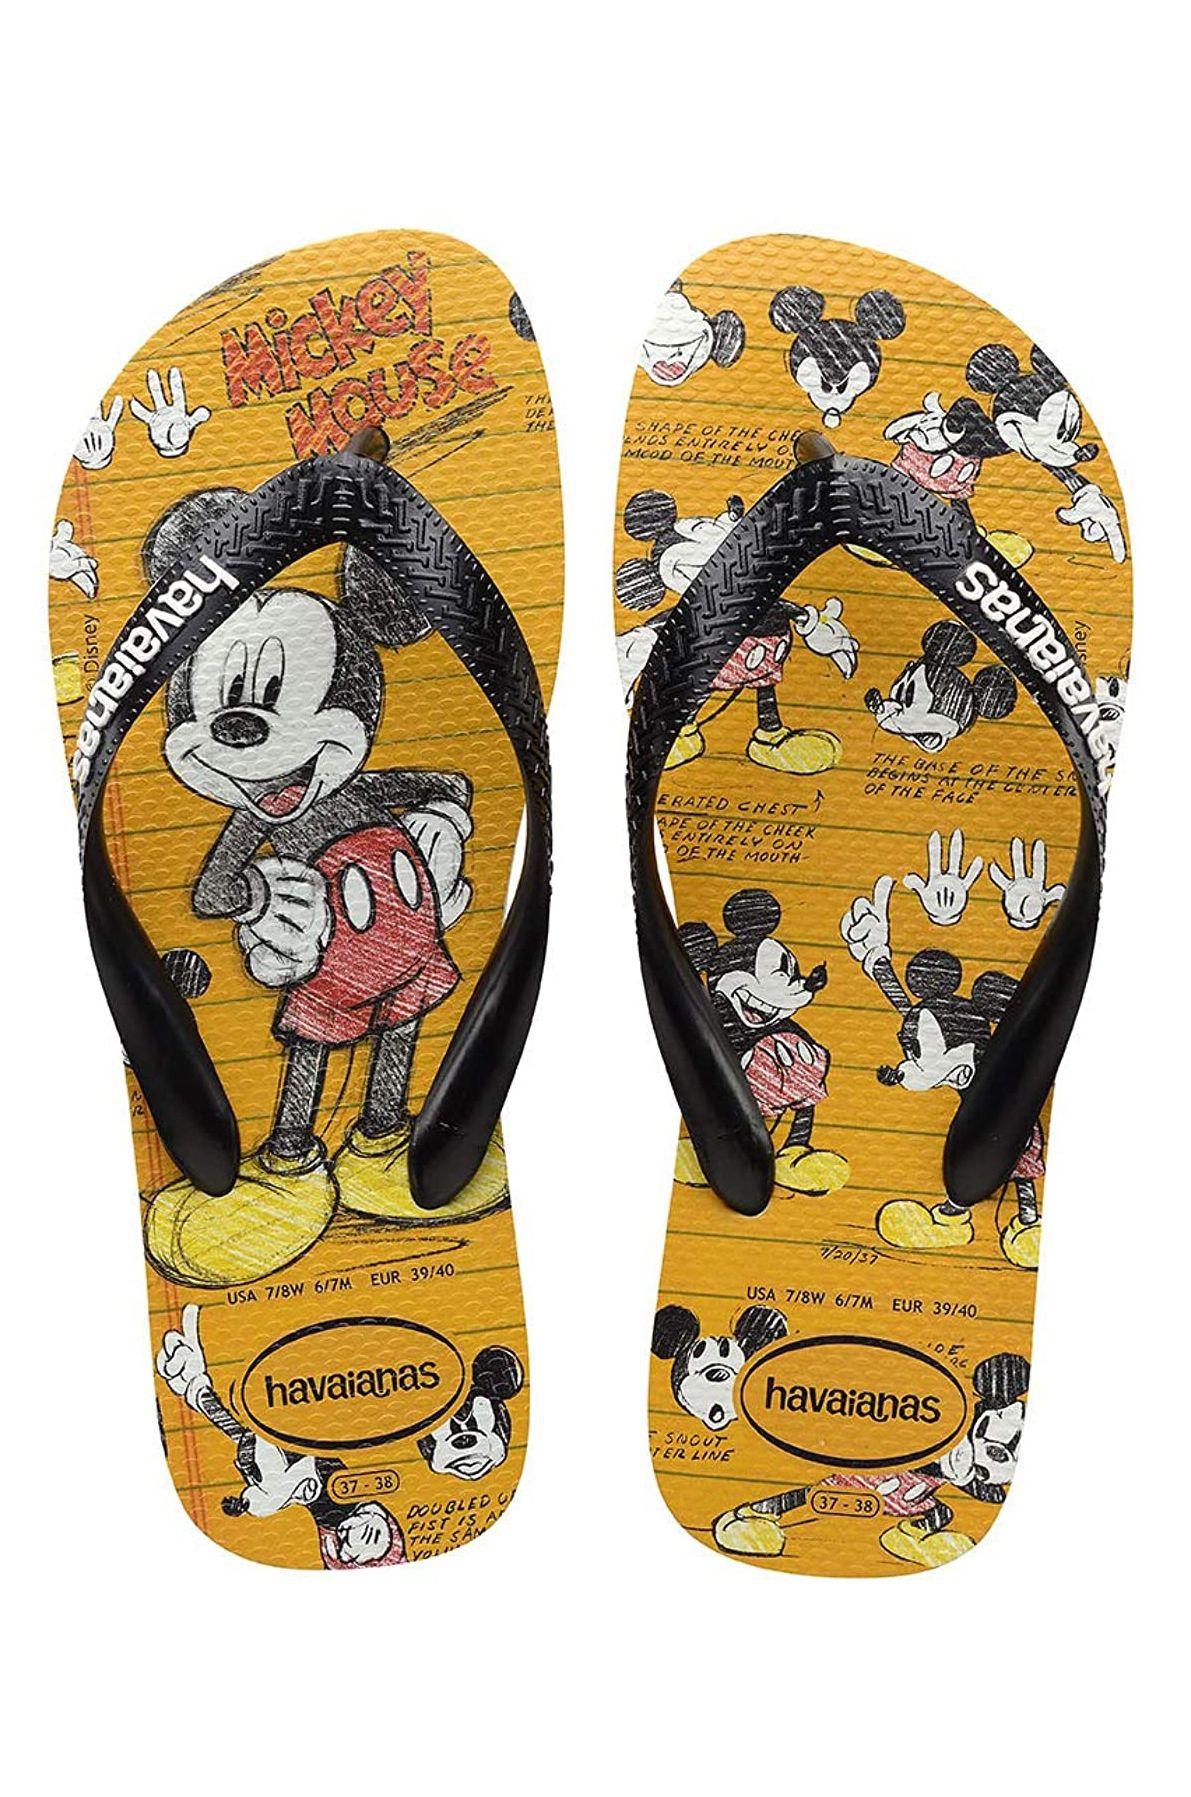 Havaianas Sandals DISNEY STYLISH White/Black/White